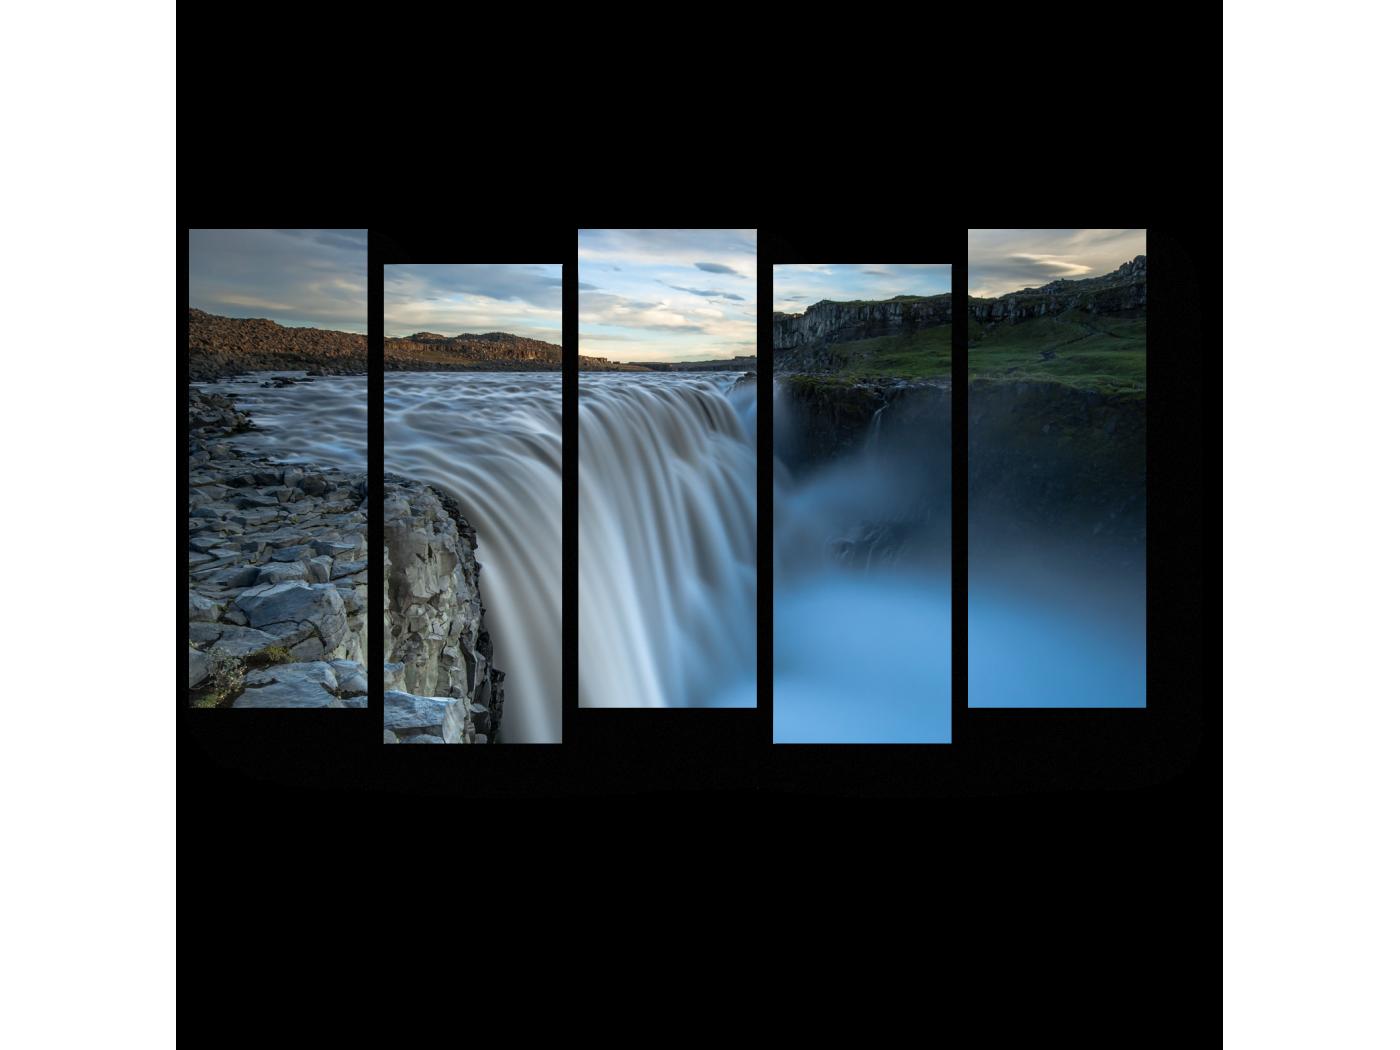 Модульная картина Неземная красота водопада (90x52) фото